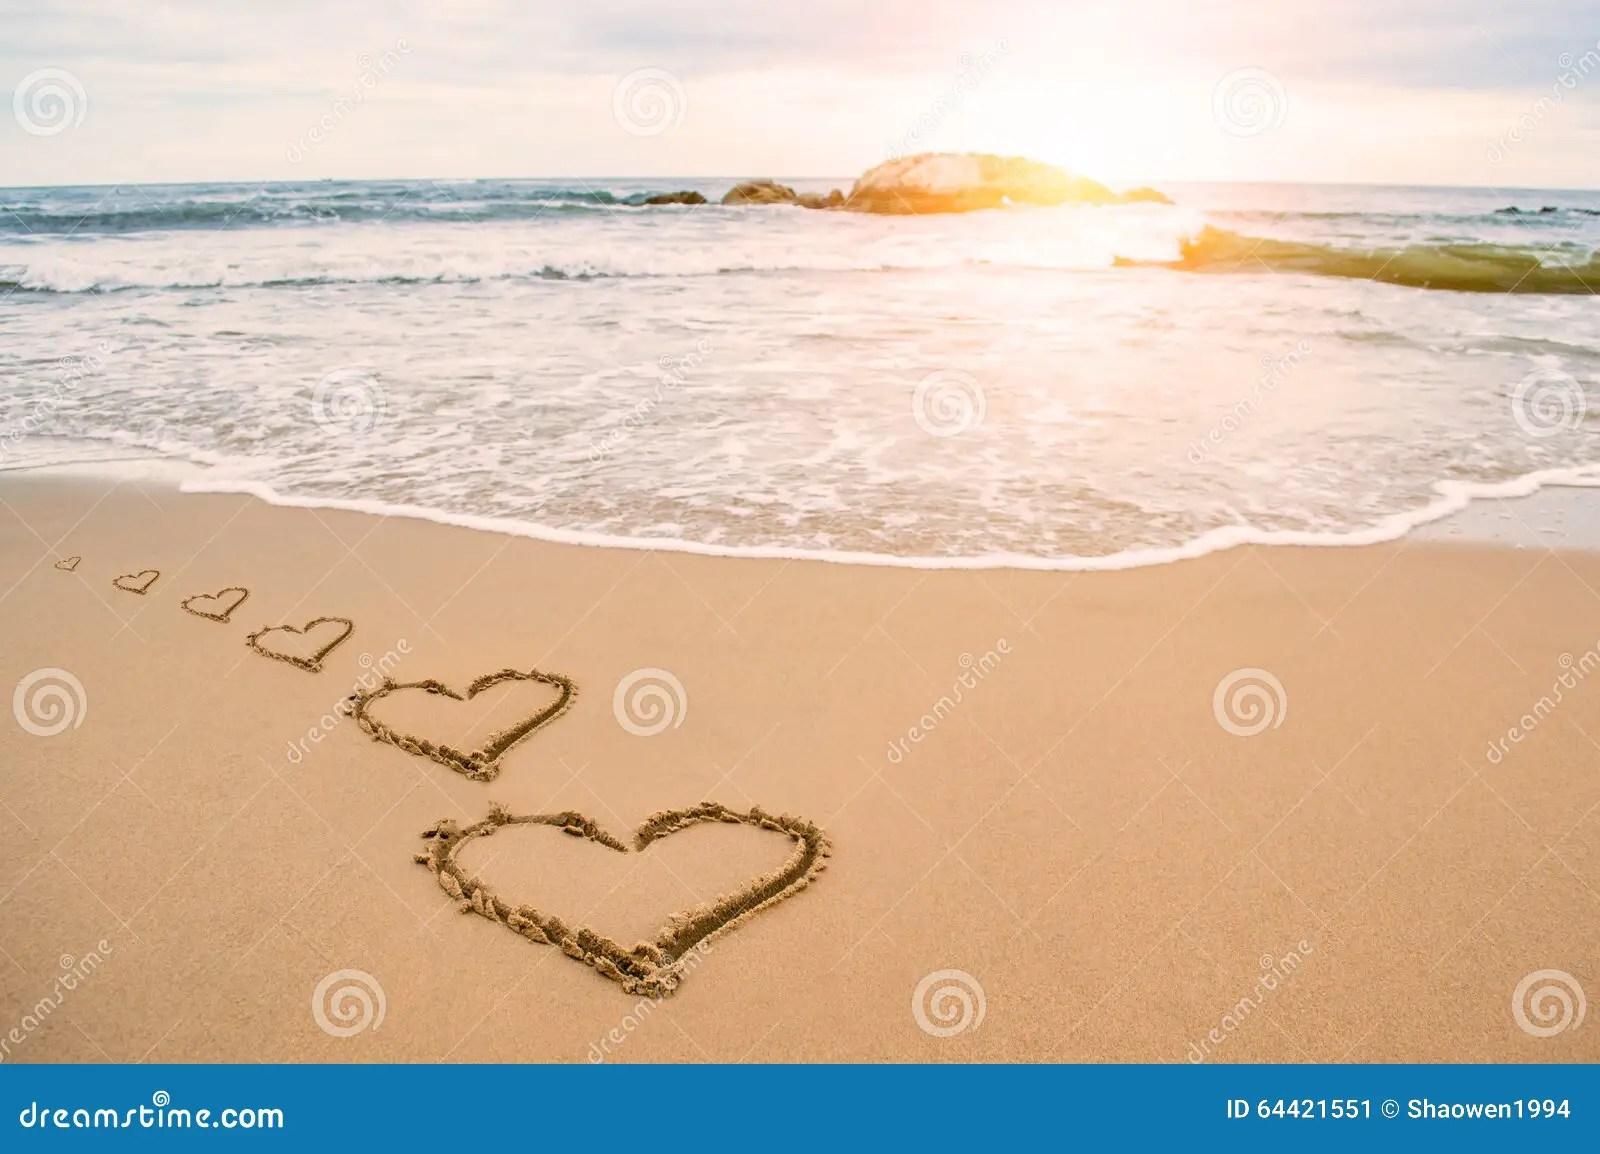 Lds Quote Wallpaper Love Heart Romantic Beach Stock Photo Image 64421551